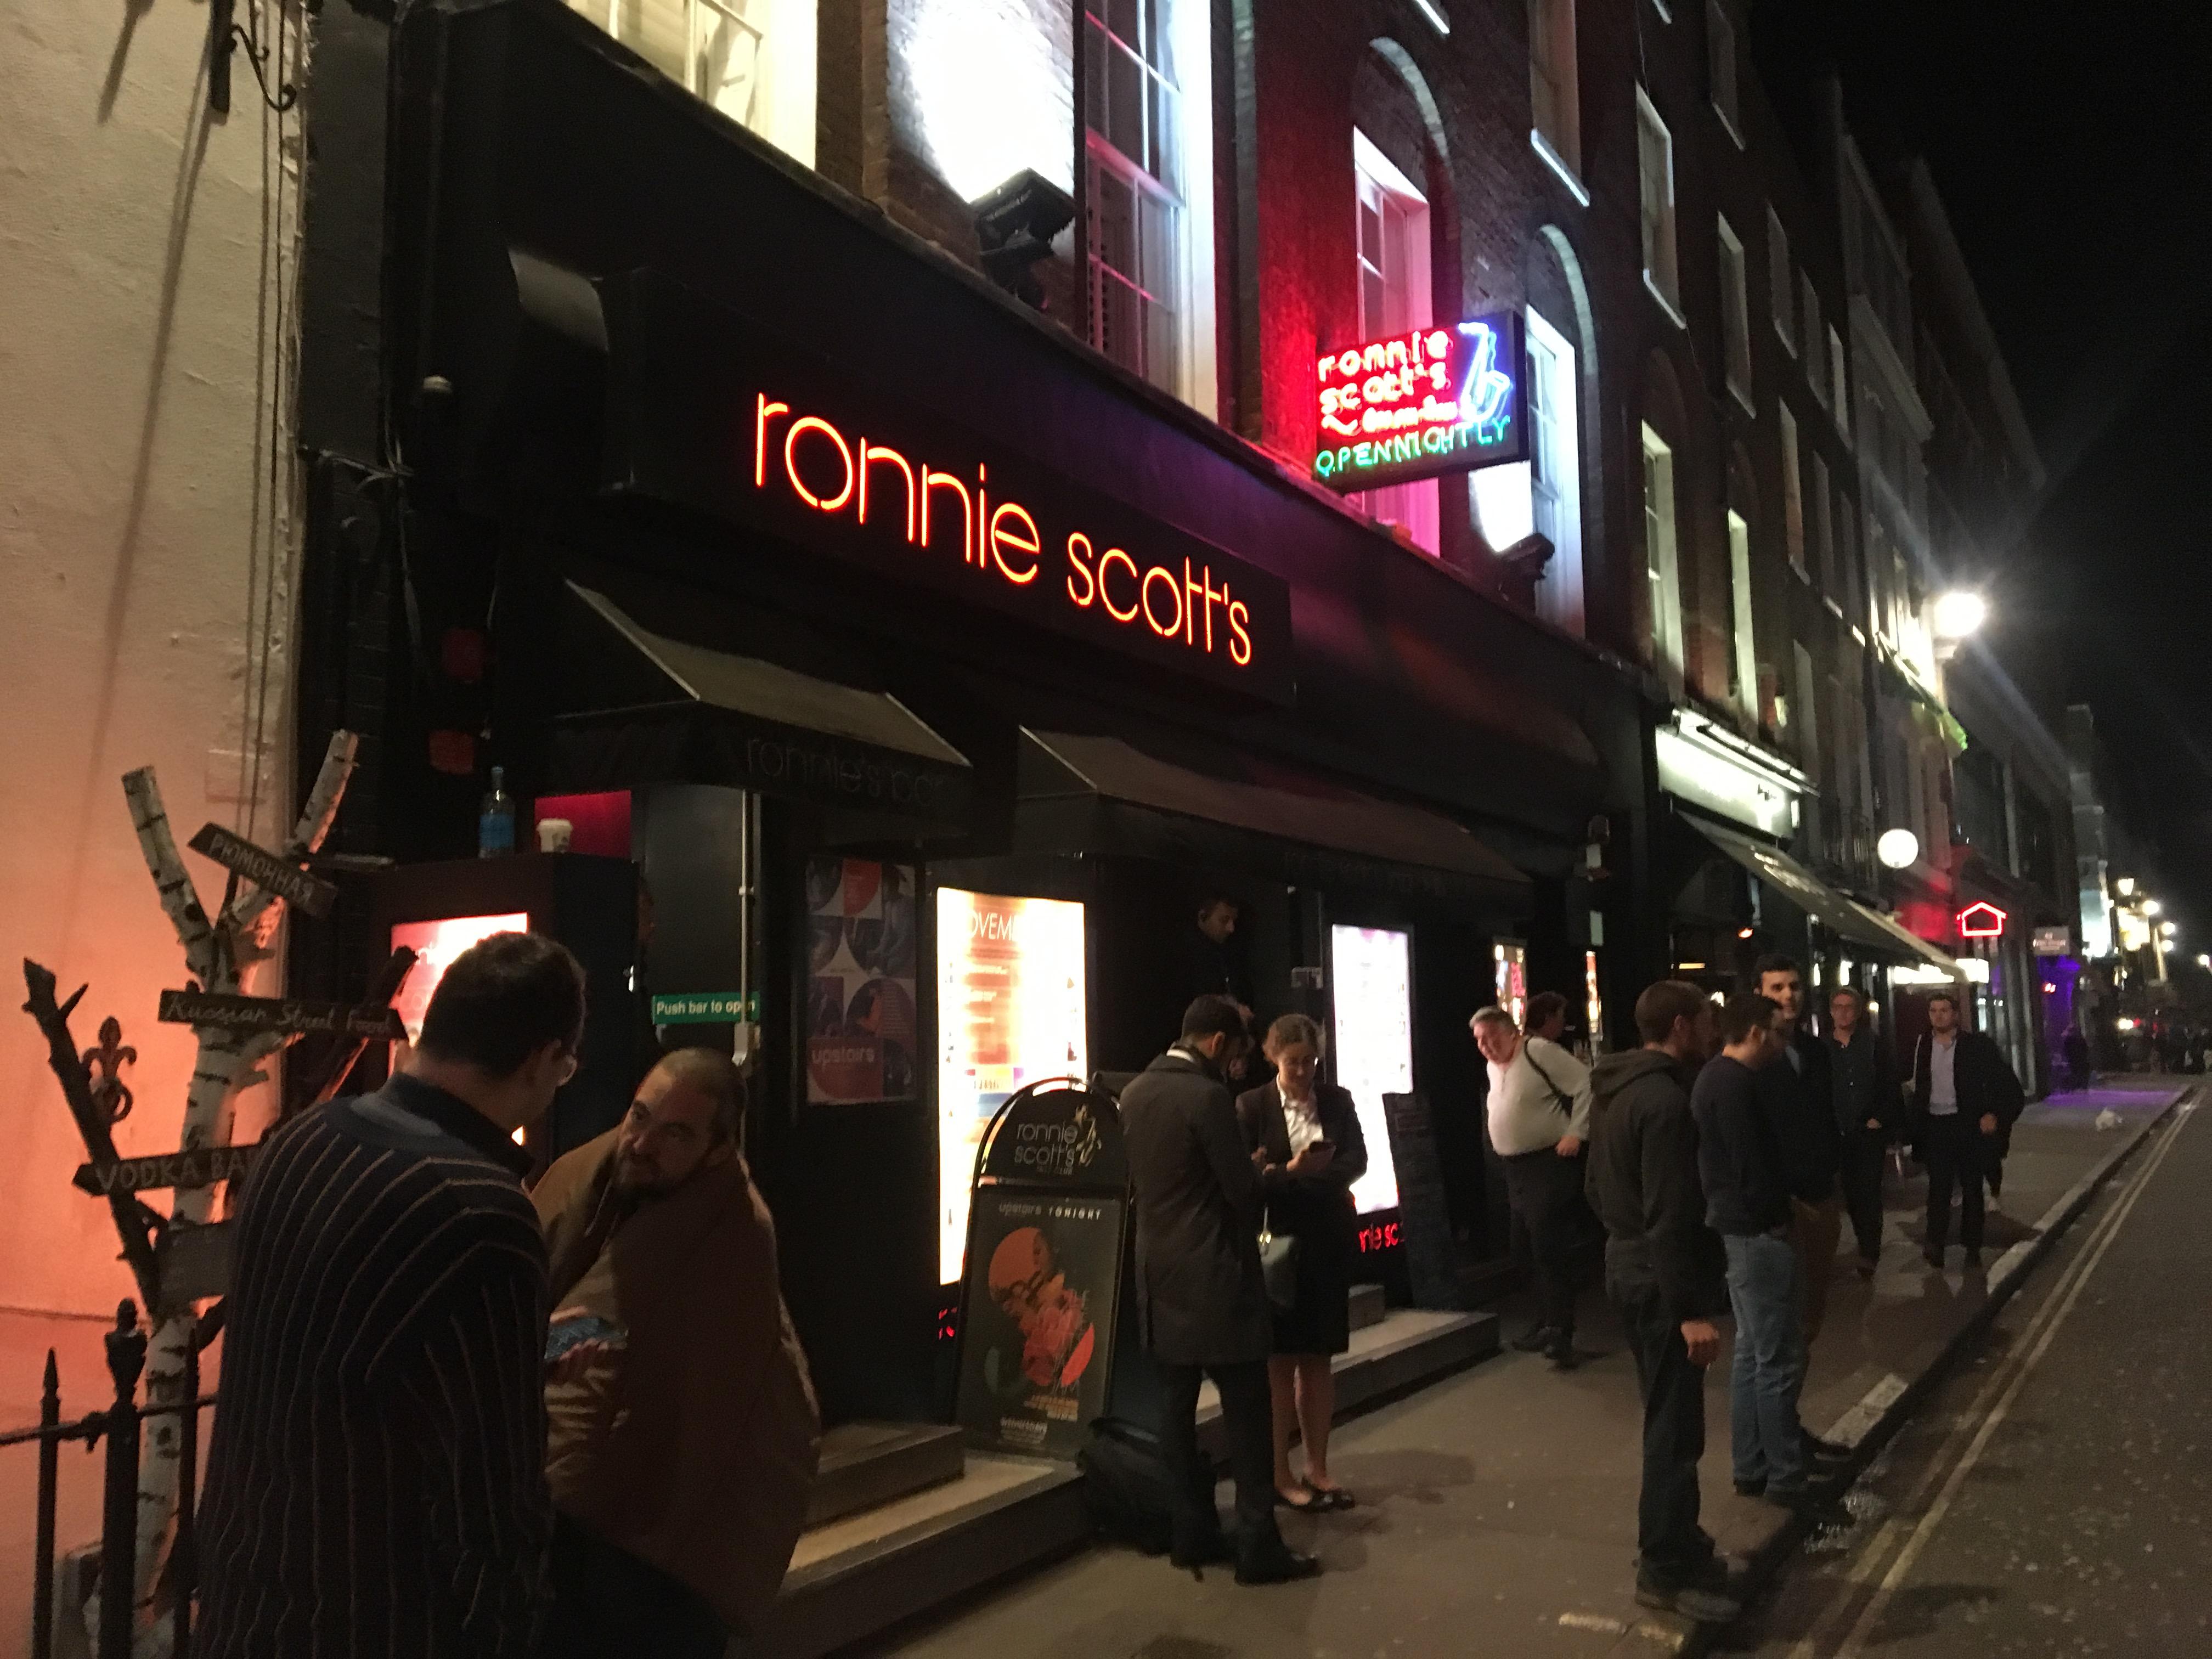 Ronnie Scott's at 60